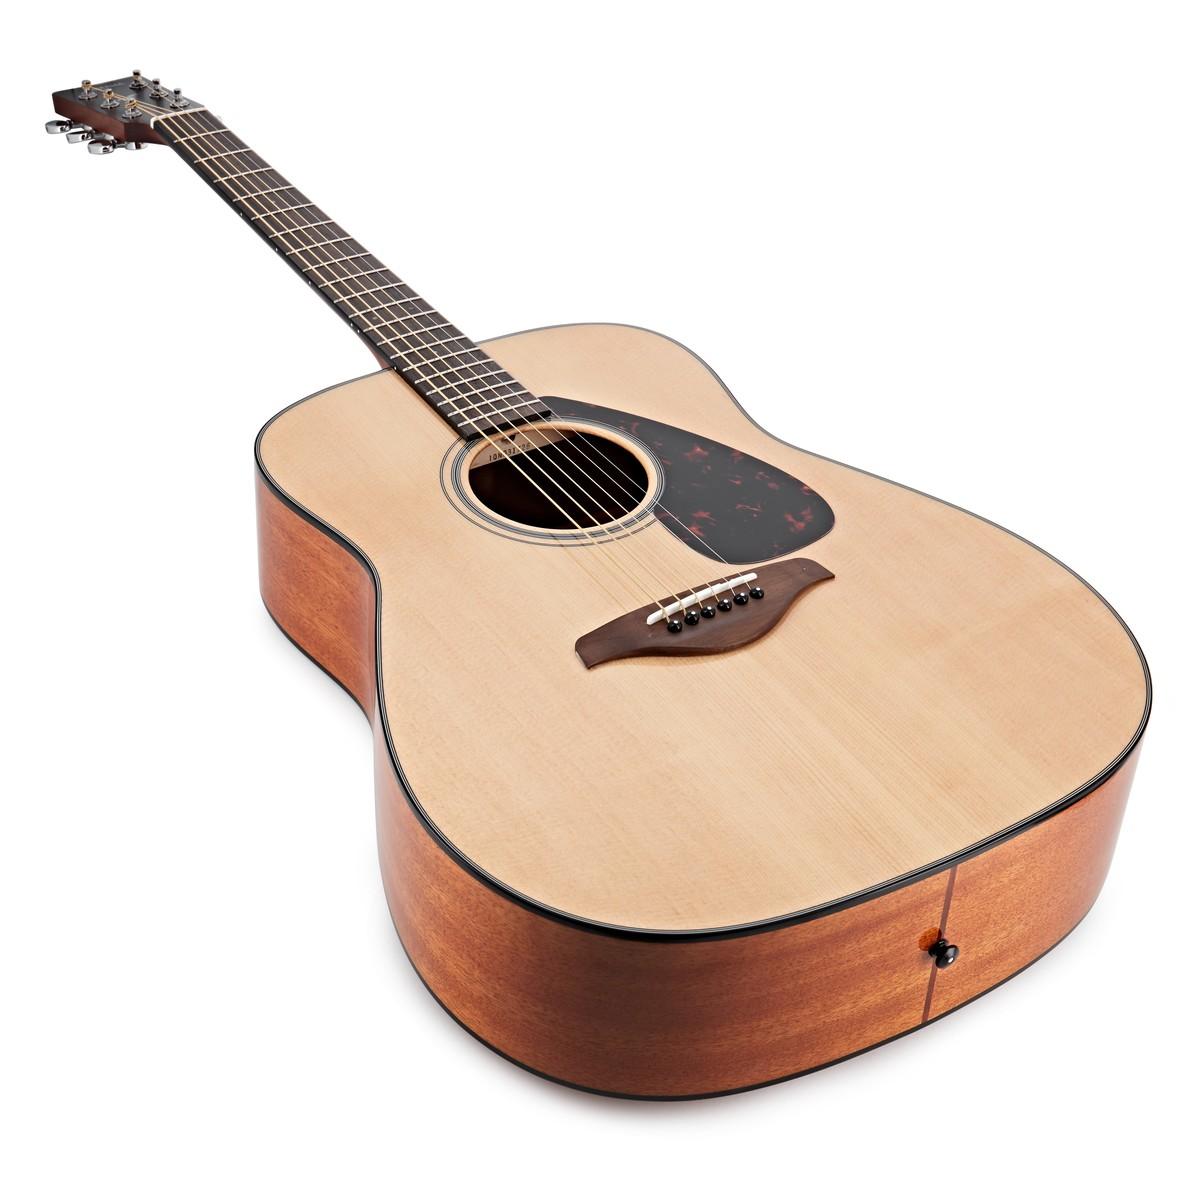 Yamaha FG800 Akustisk Gitar, Naturlig | Gear4music